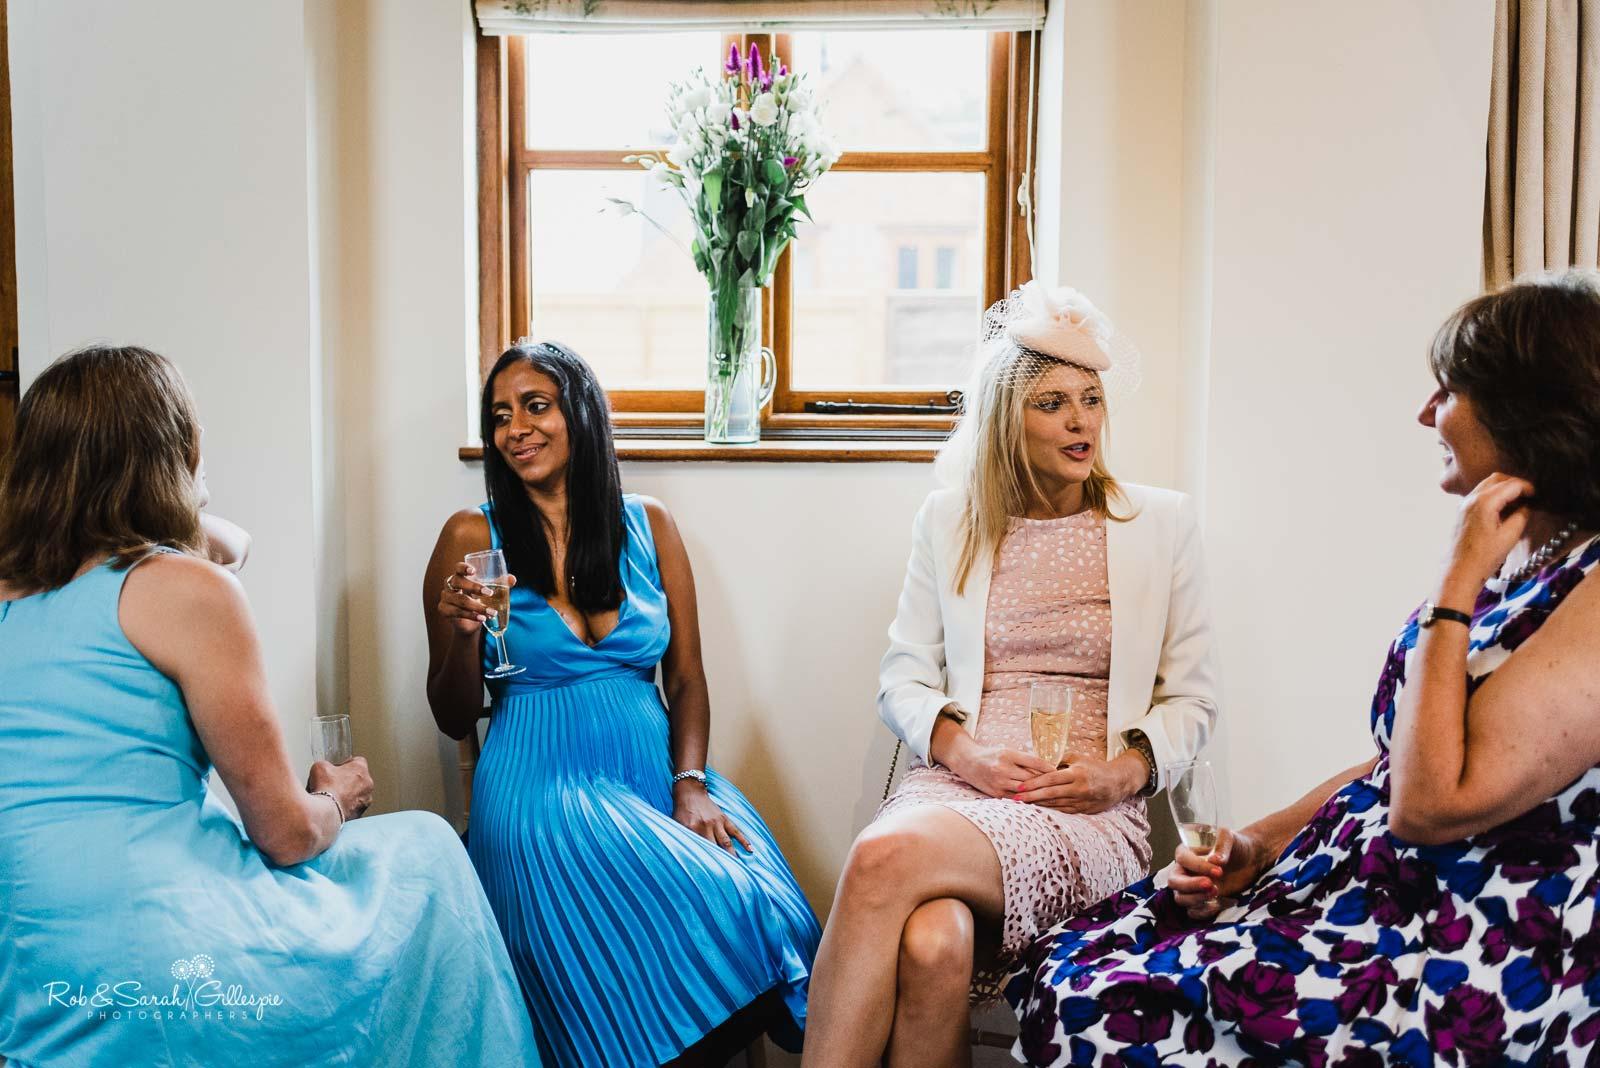 Natural wedding photography at Wethele Manor